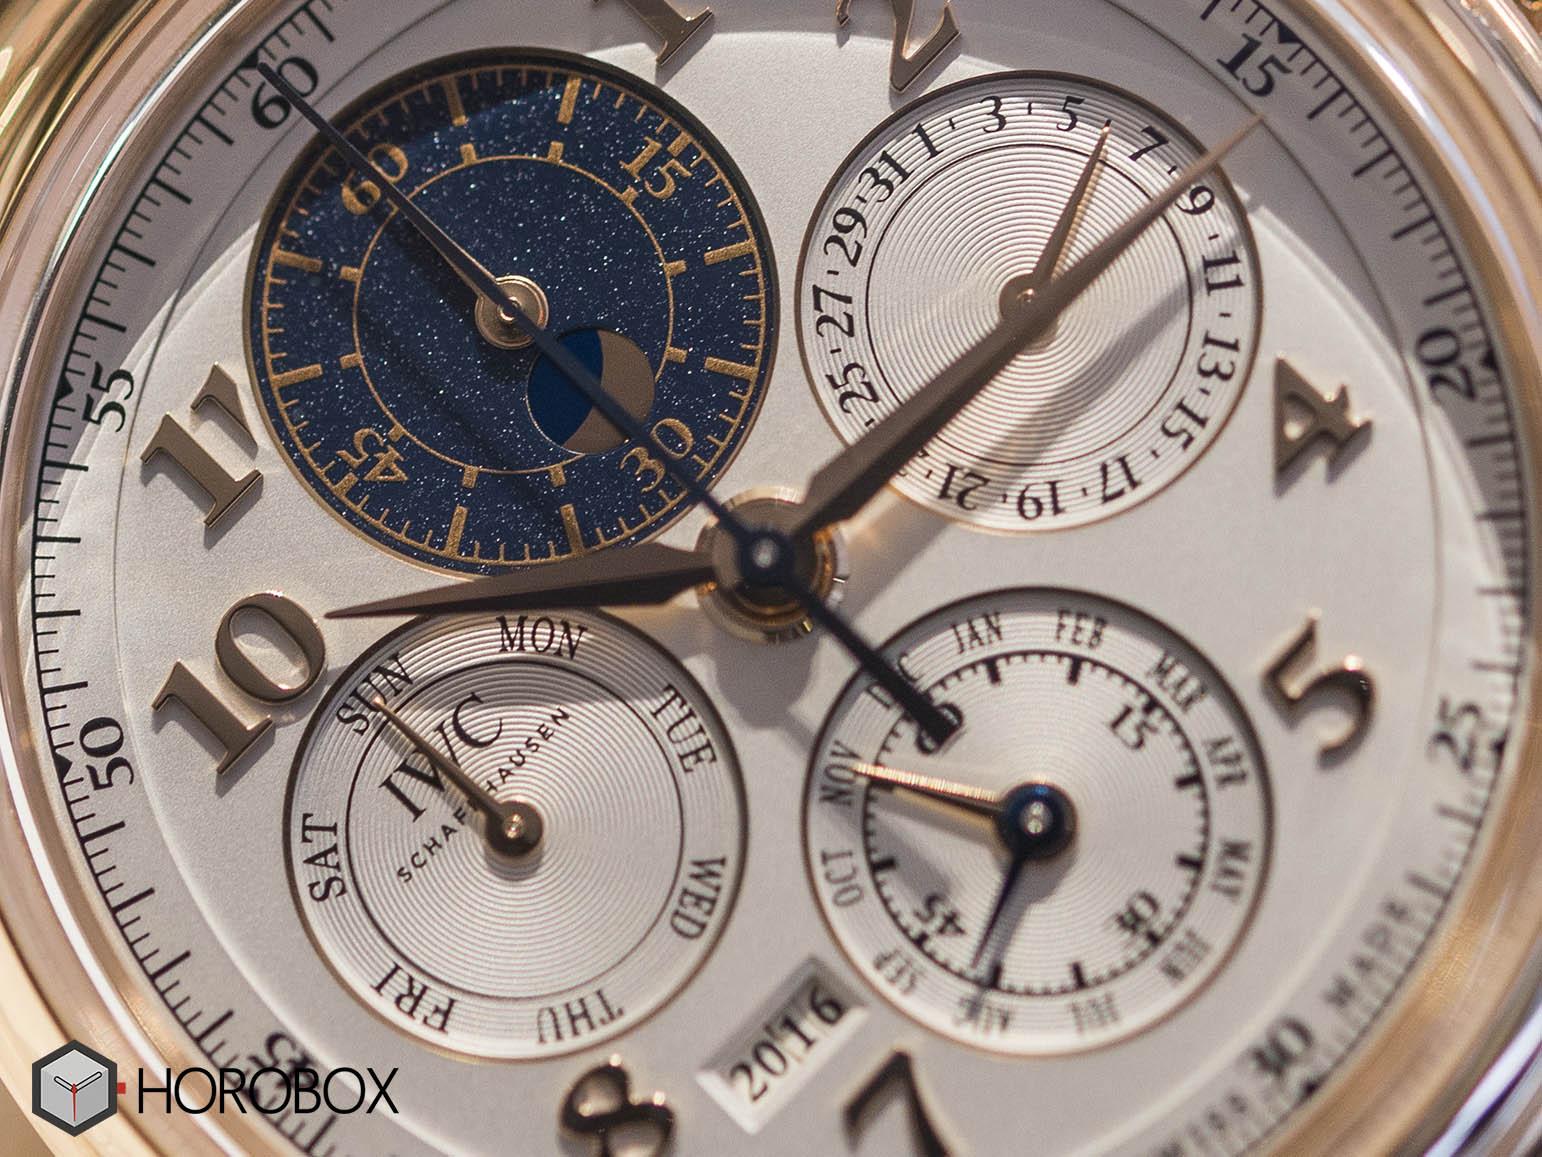 iwc-da-vinci-perpetual-calendar-chronograph-iw392101-2-.jpg